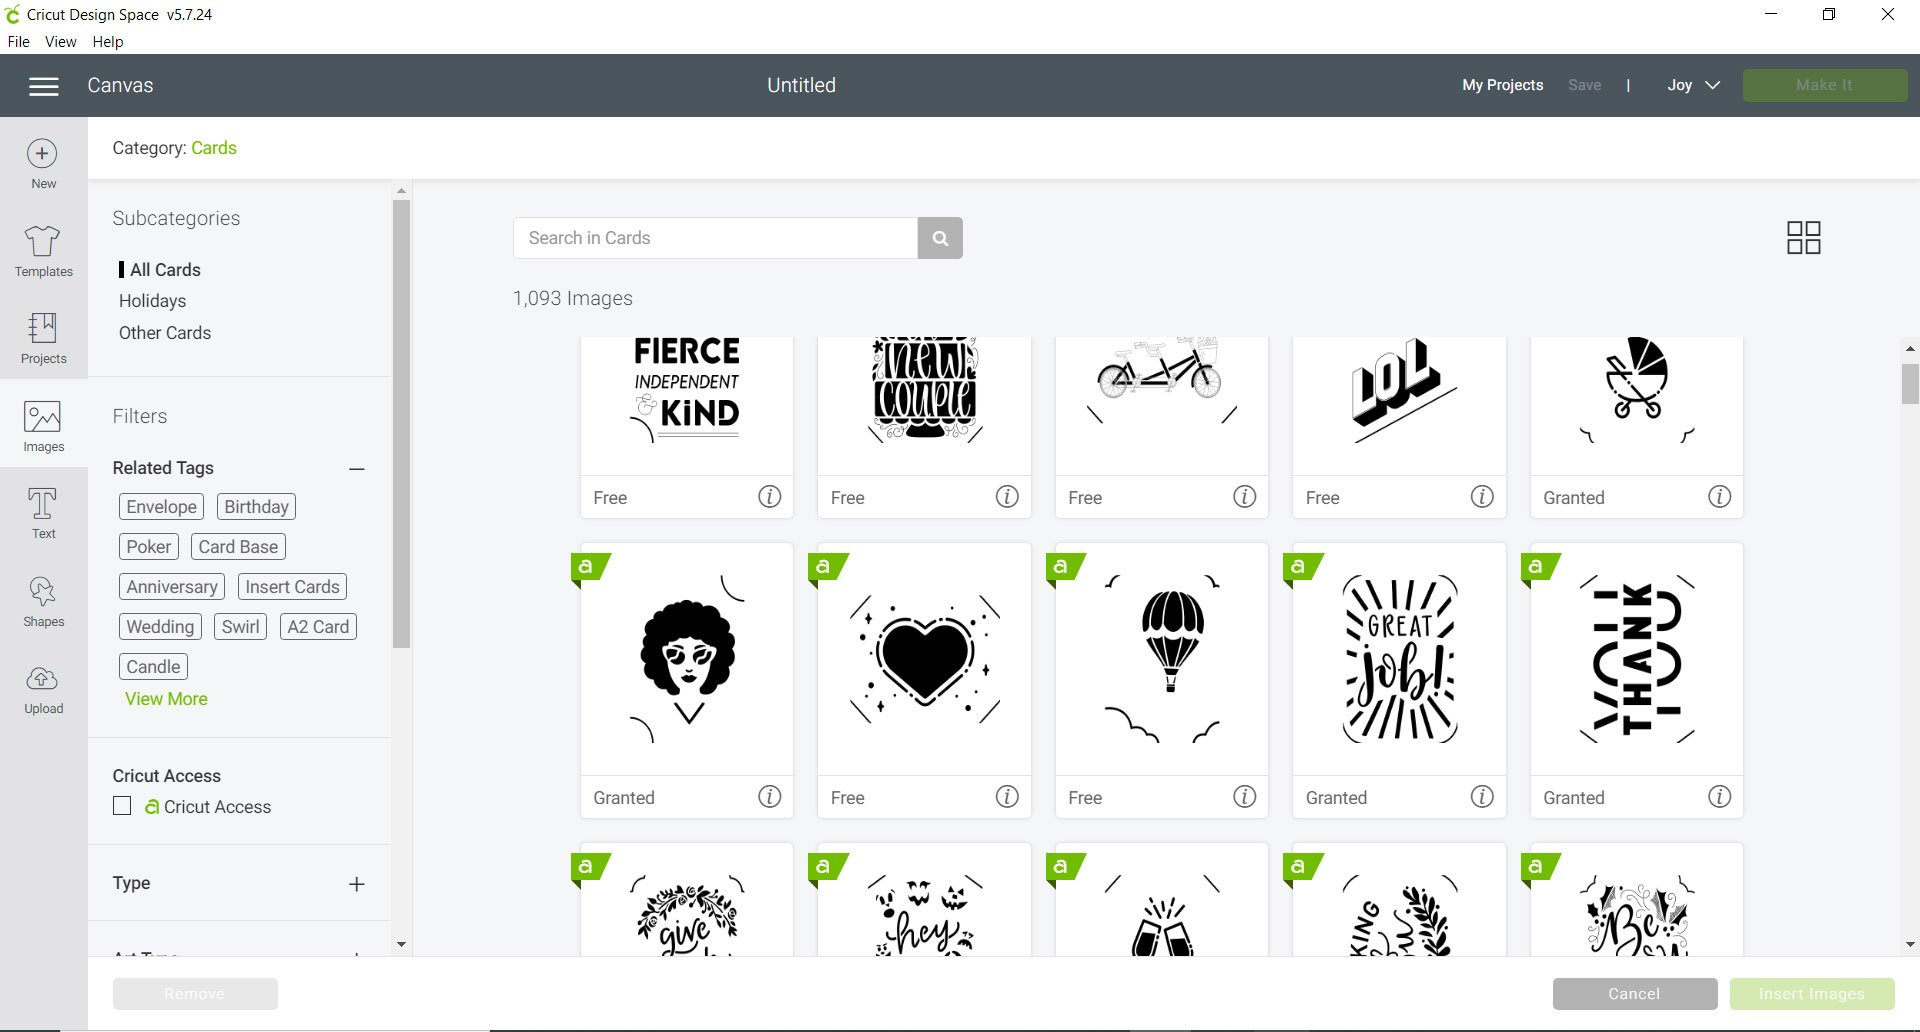 card designs Cricut Design Space